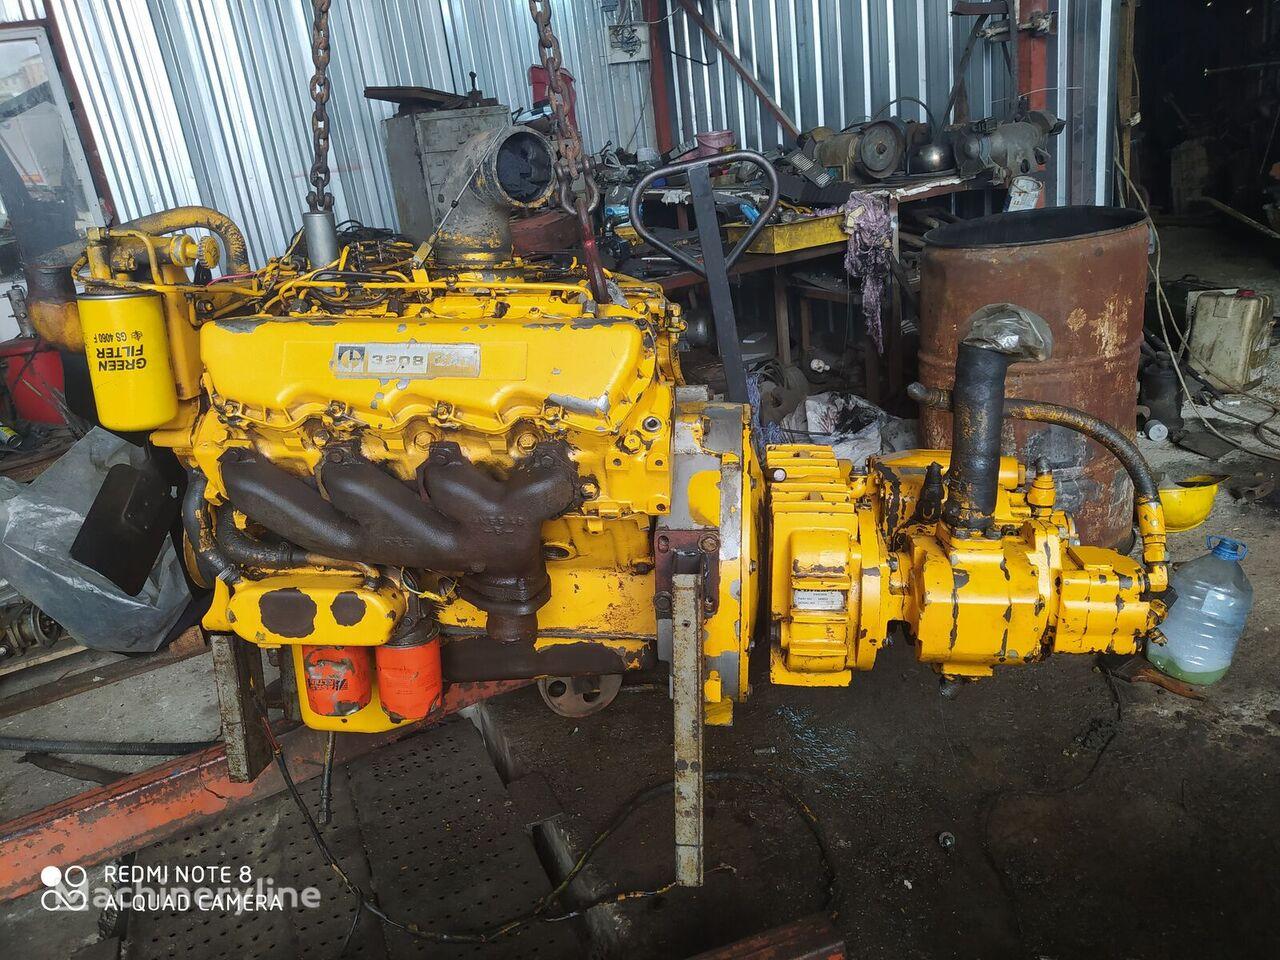 CATERPILLAR 3208 engine for construction roller